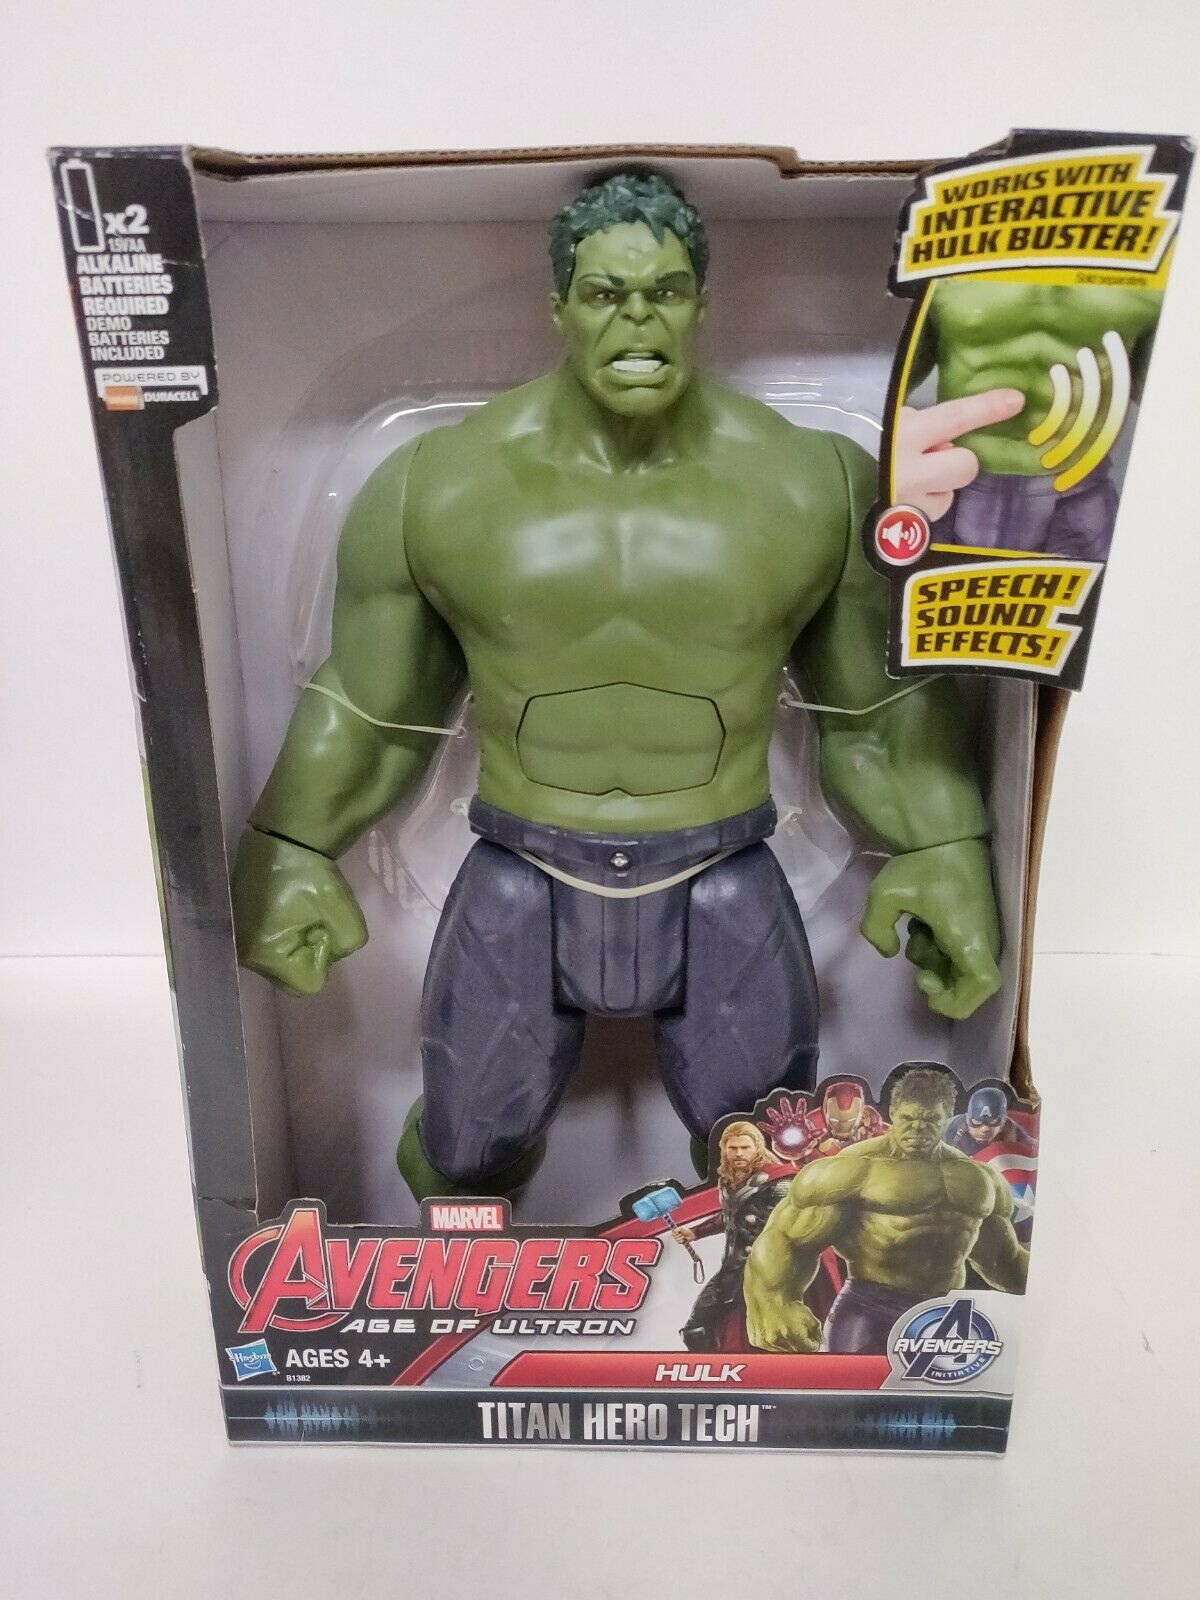 Hulk  cifra - Marvel Avengers Age of Ultron Titan Hero Tech  migliore offerta